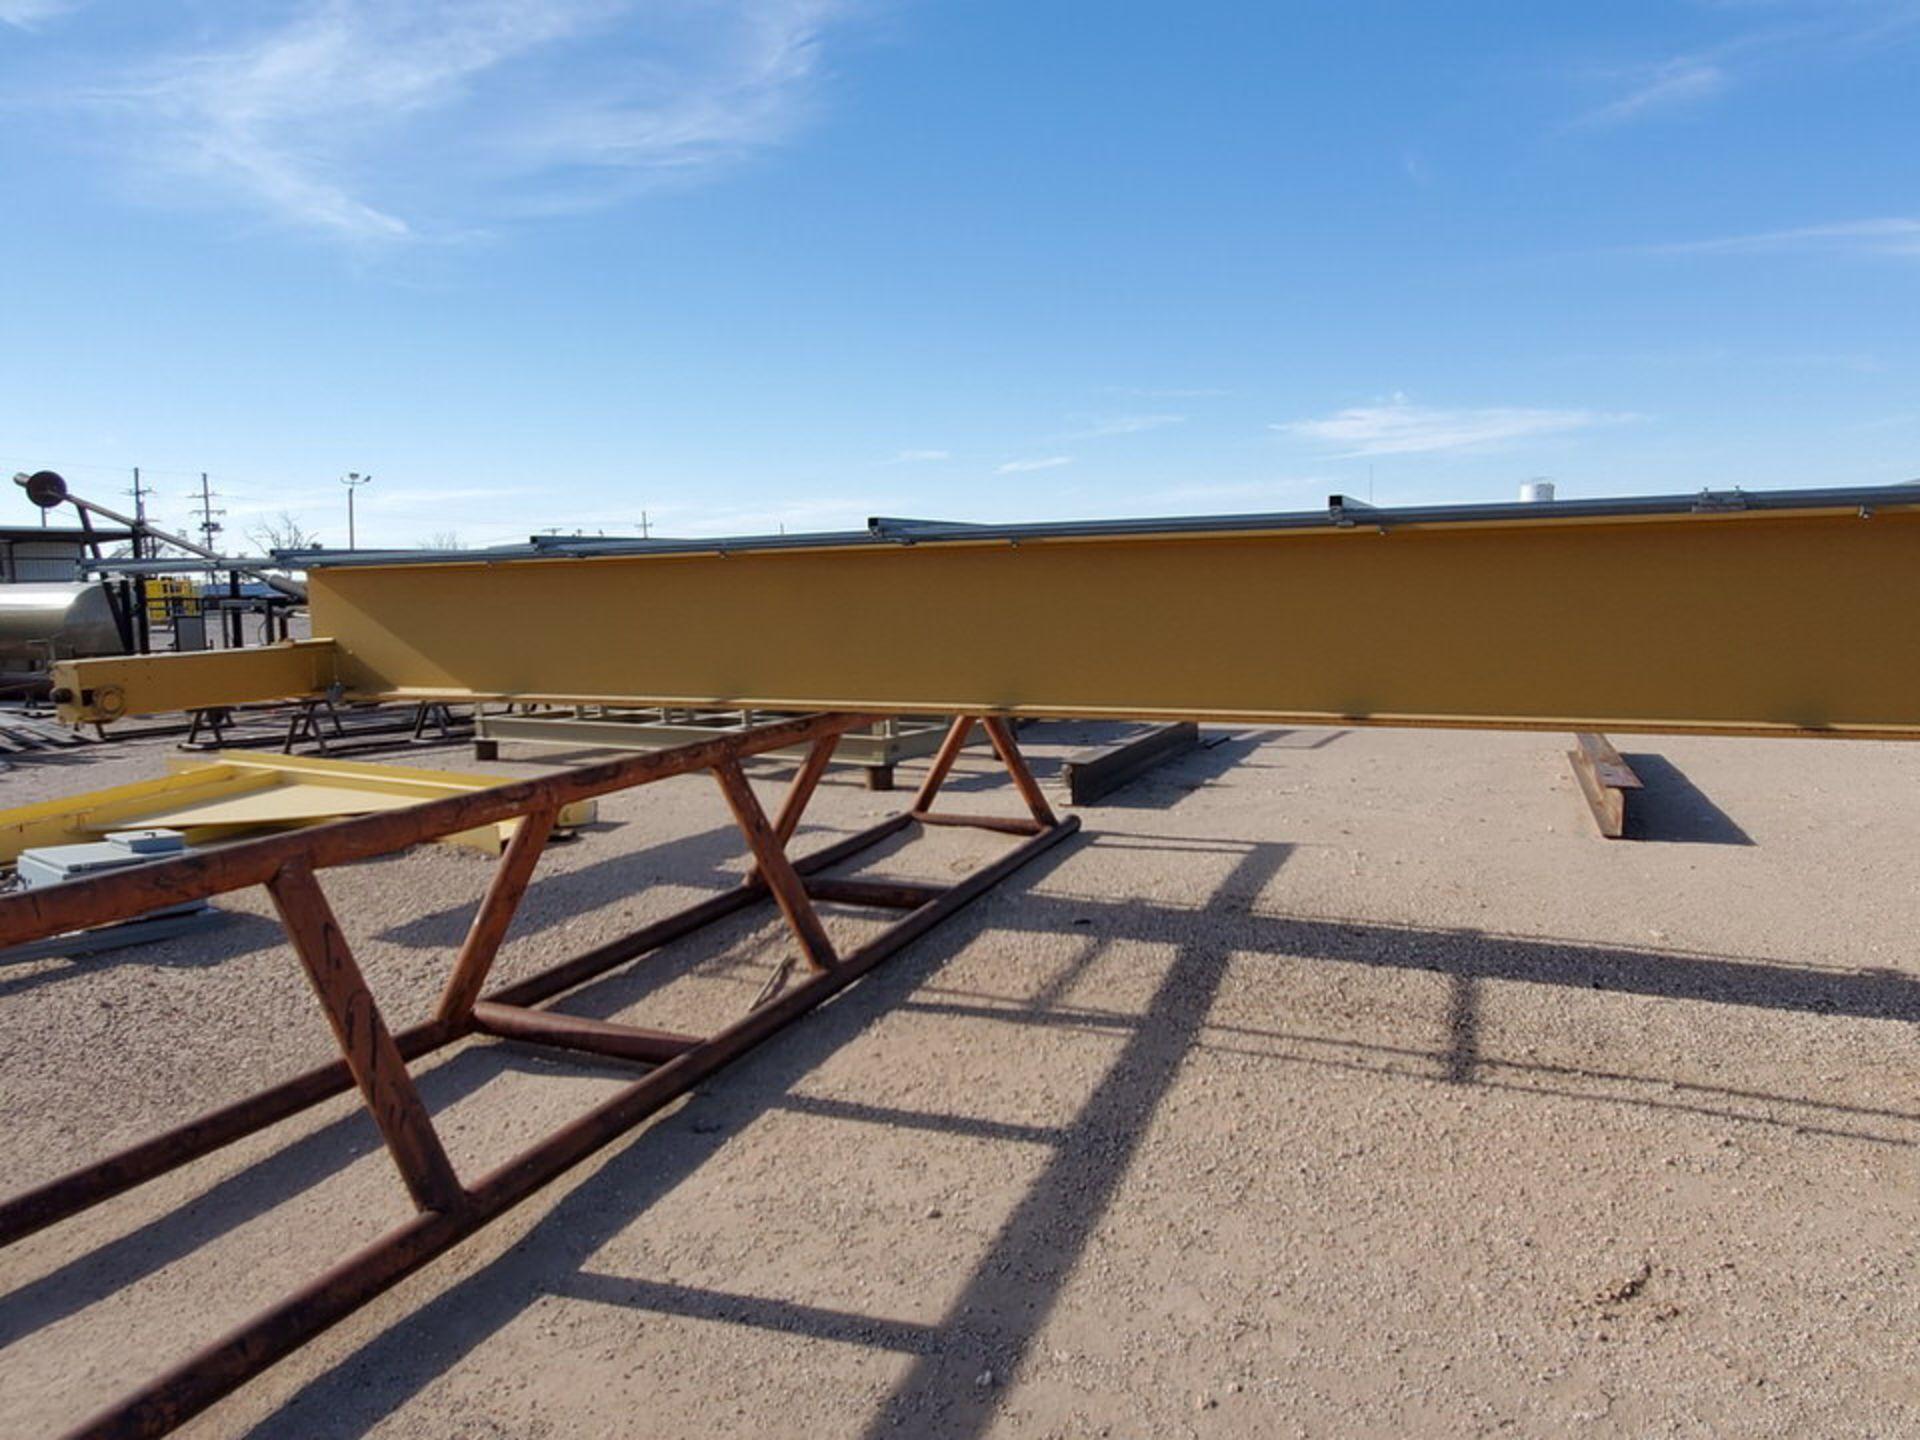 R & M 10 Ton Top Riding Bridge Crane Approx. 66' x 10'L - Image 35 of 39